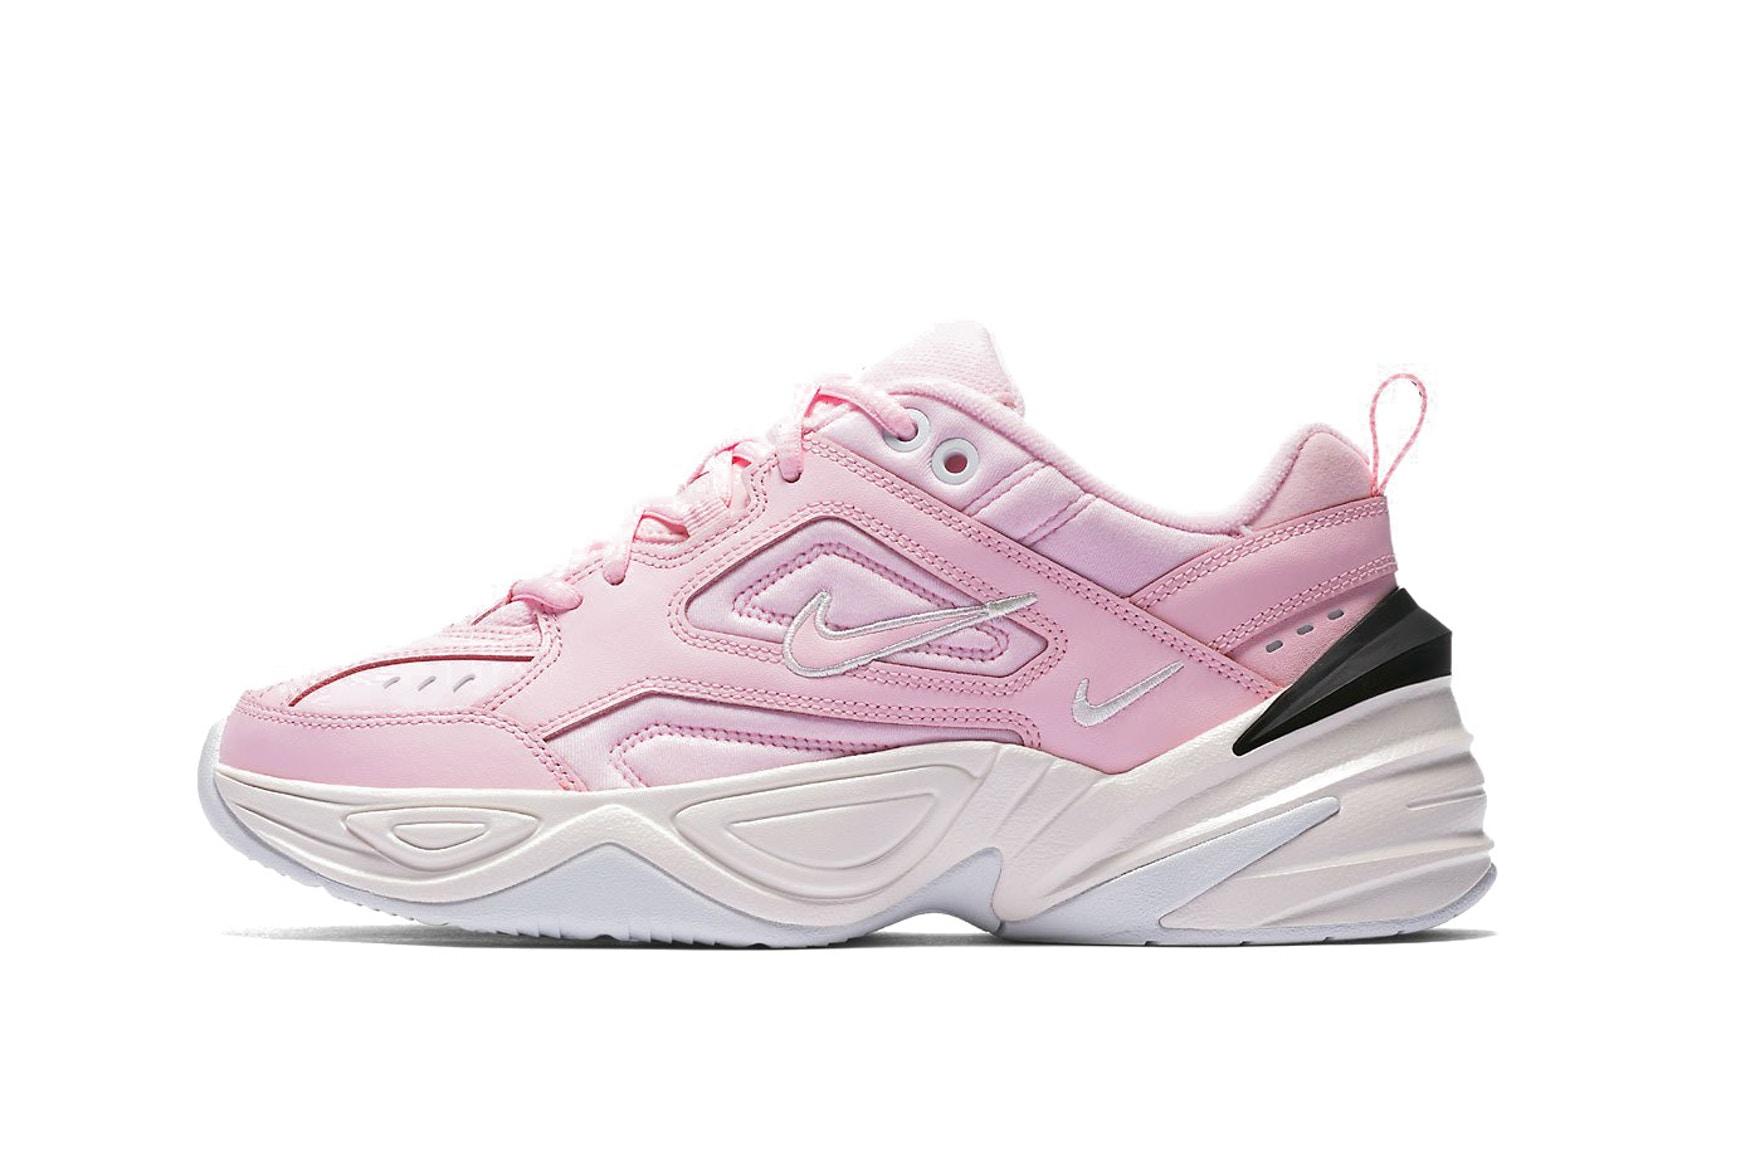 nike-m2k-tekno-pink-release-1